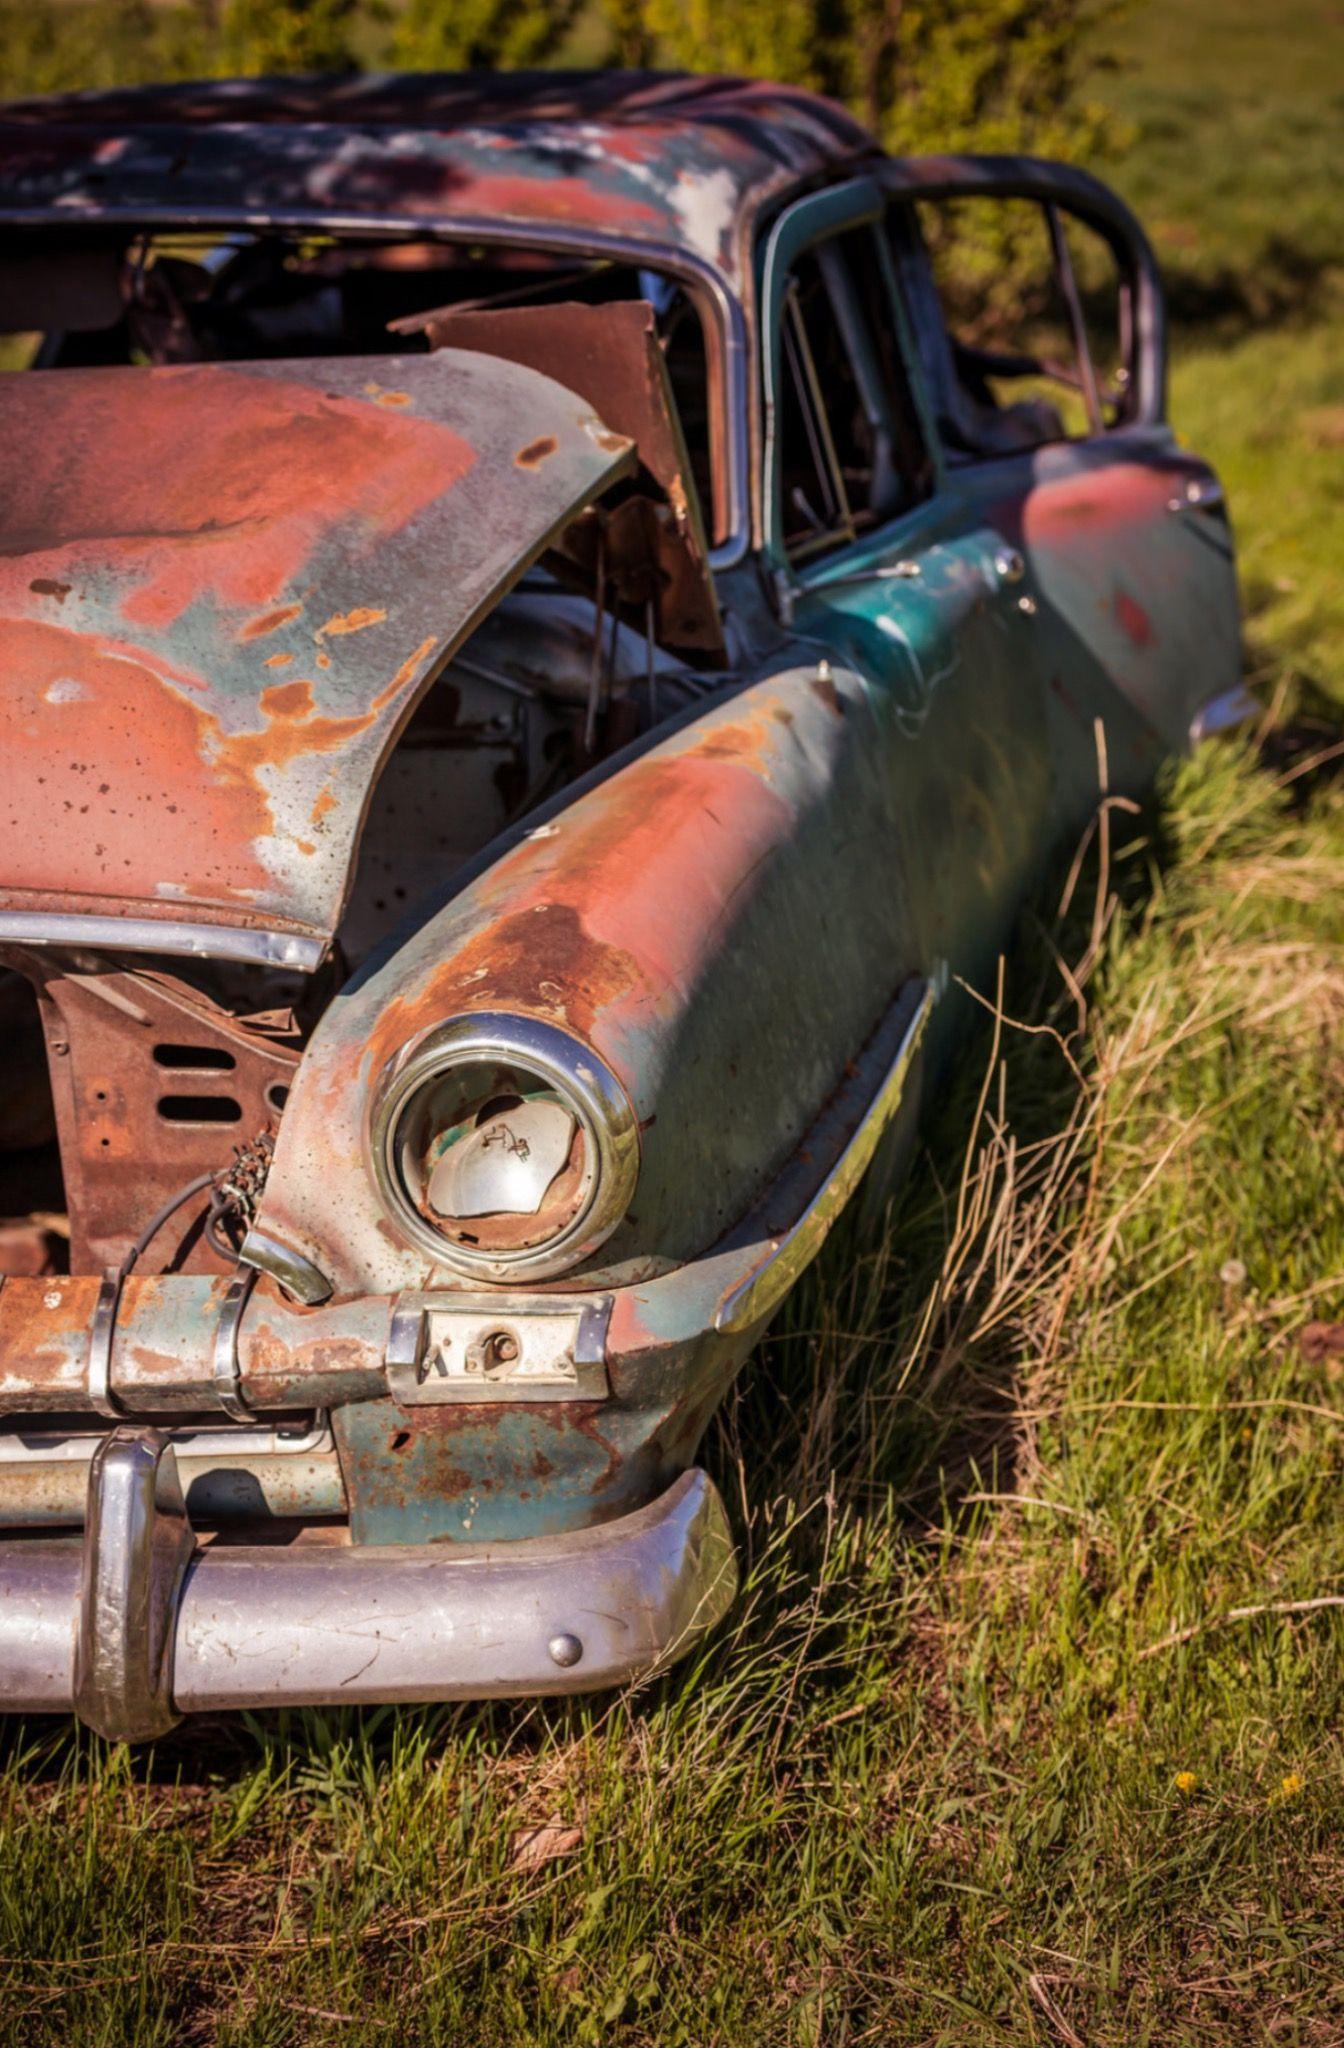 Southern Alberta Canada Photo By Wayne Stadler Source Flickr Rusty CarsAbandoned CarsBarn FindsBarn